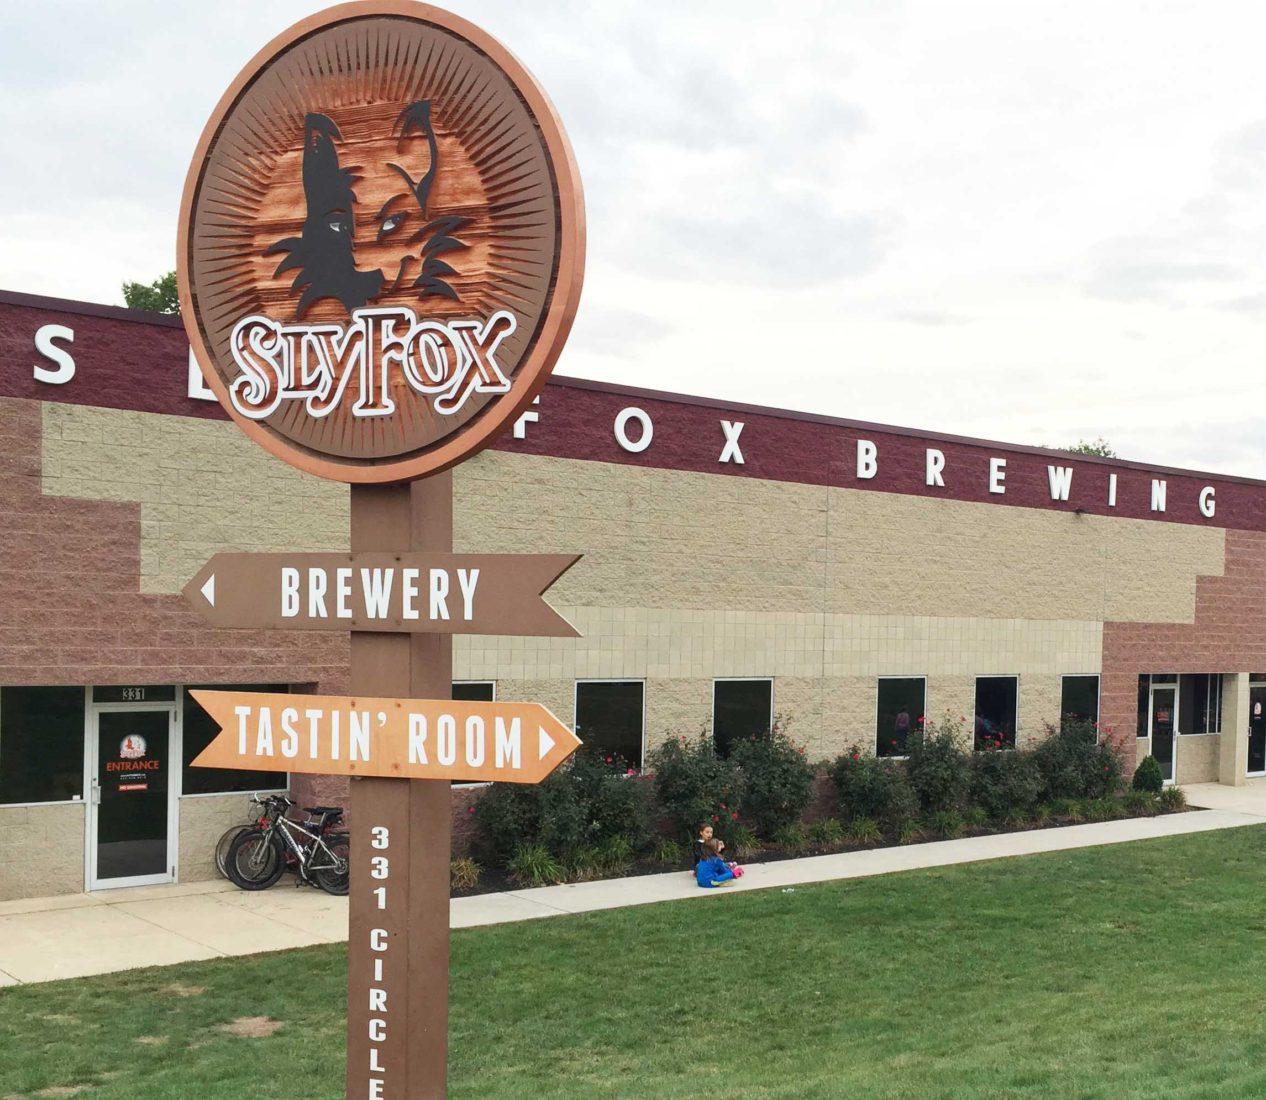 249. Sly Fox Brewery, Pottstown PA, 2015